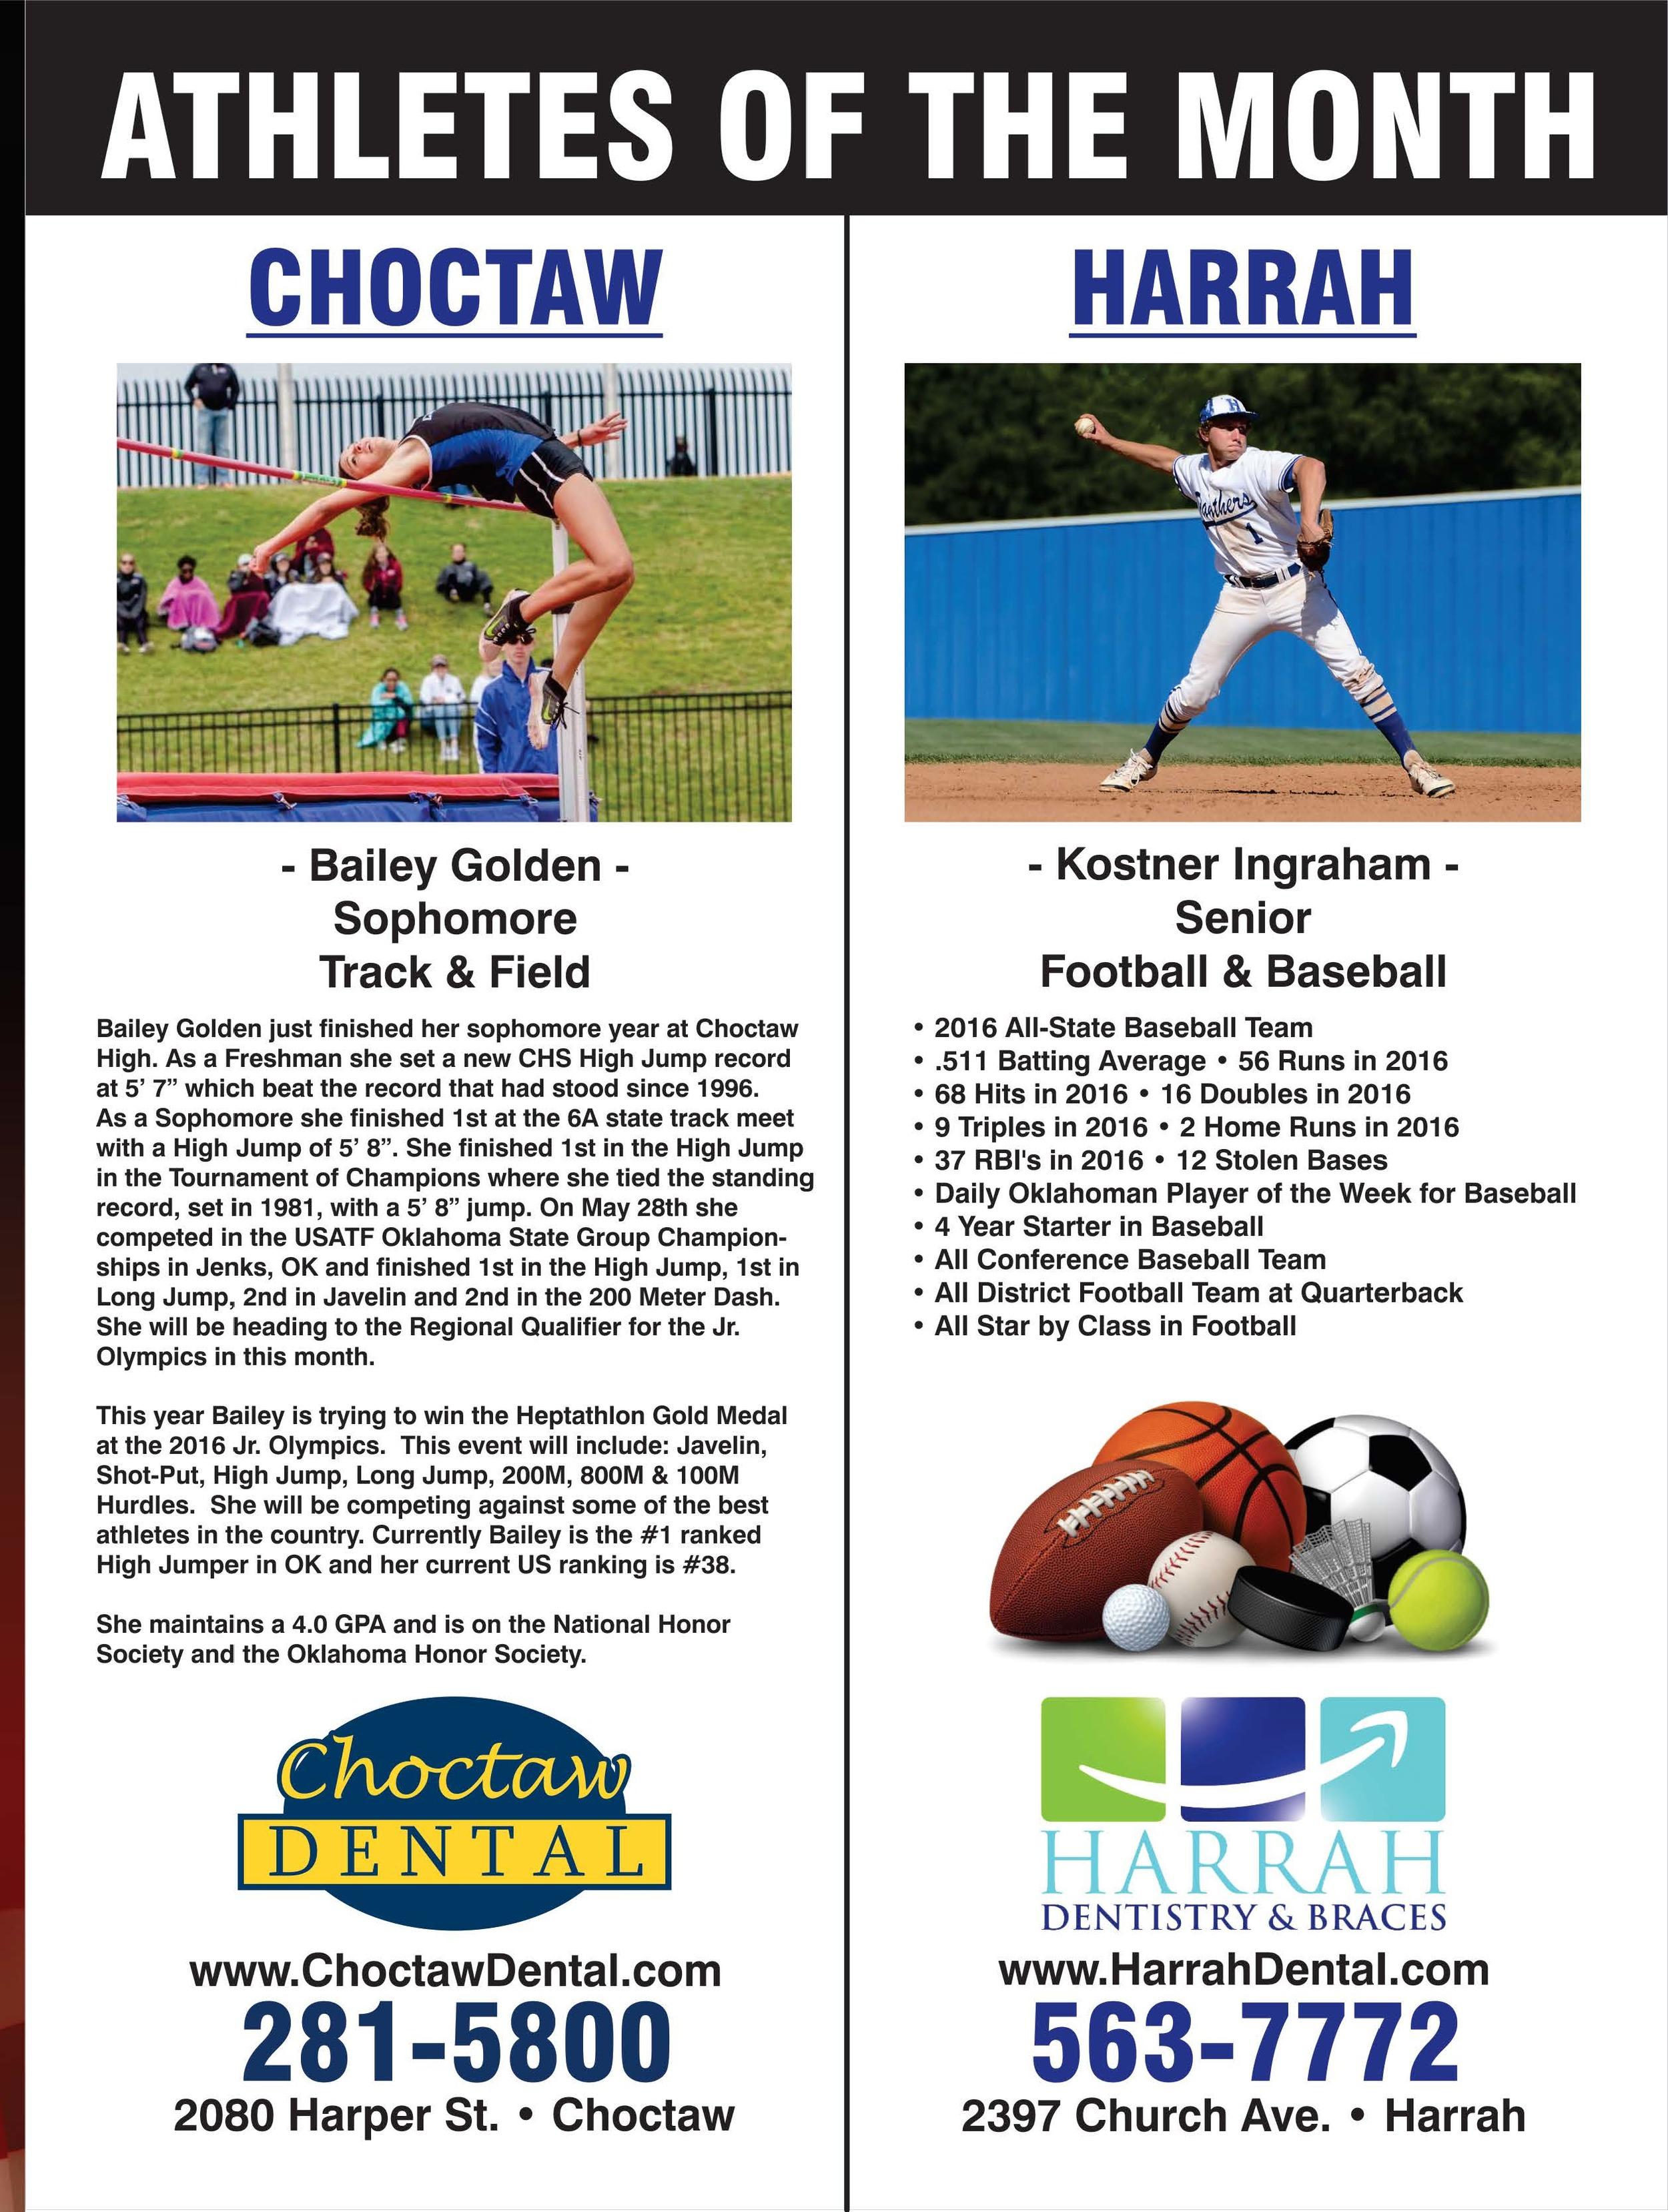 HighFive_ChoctawHarrah_June 2016 REVISED_Page_03.jpg